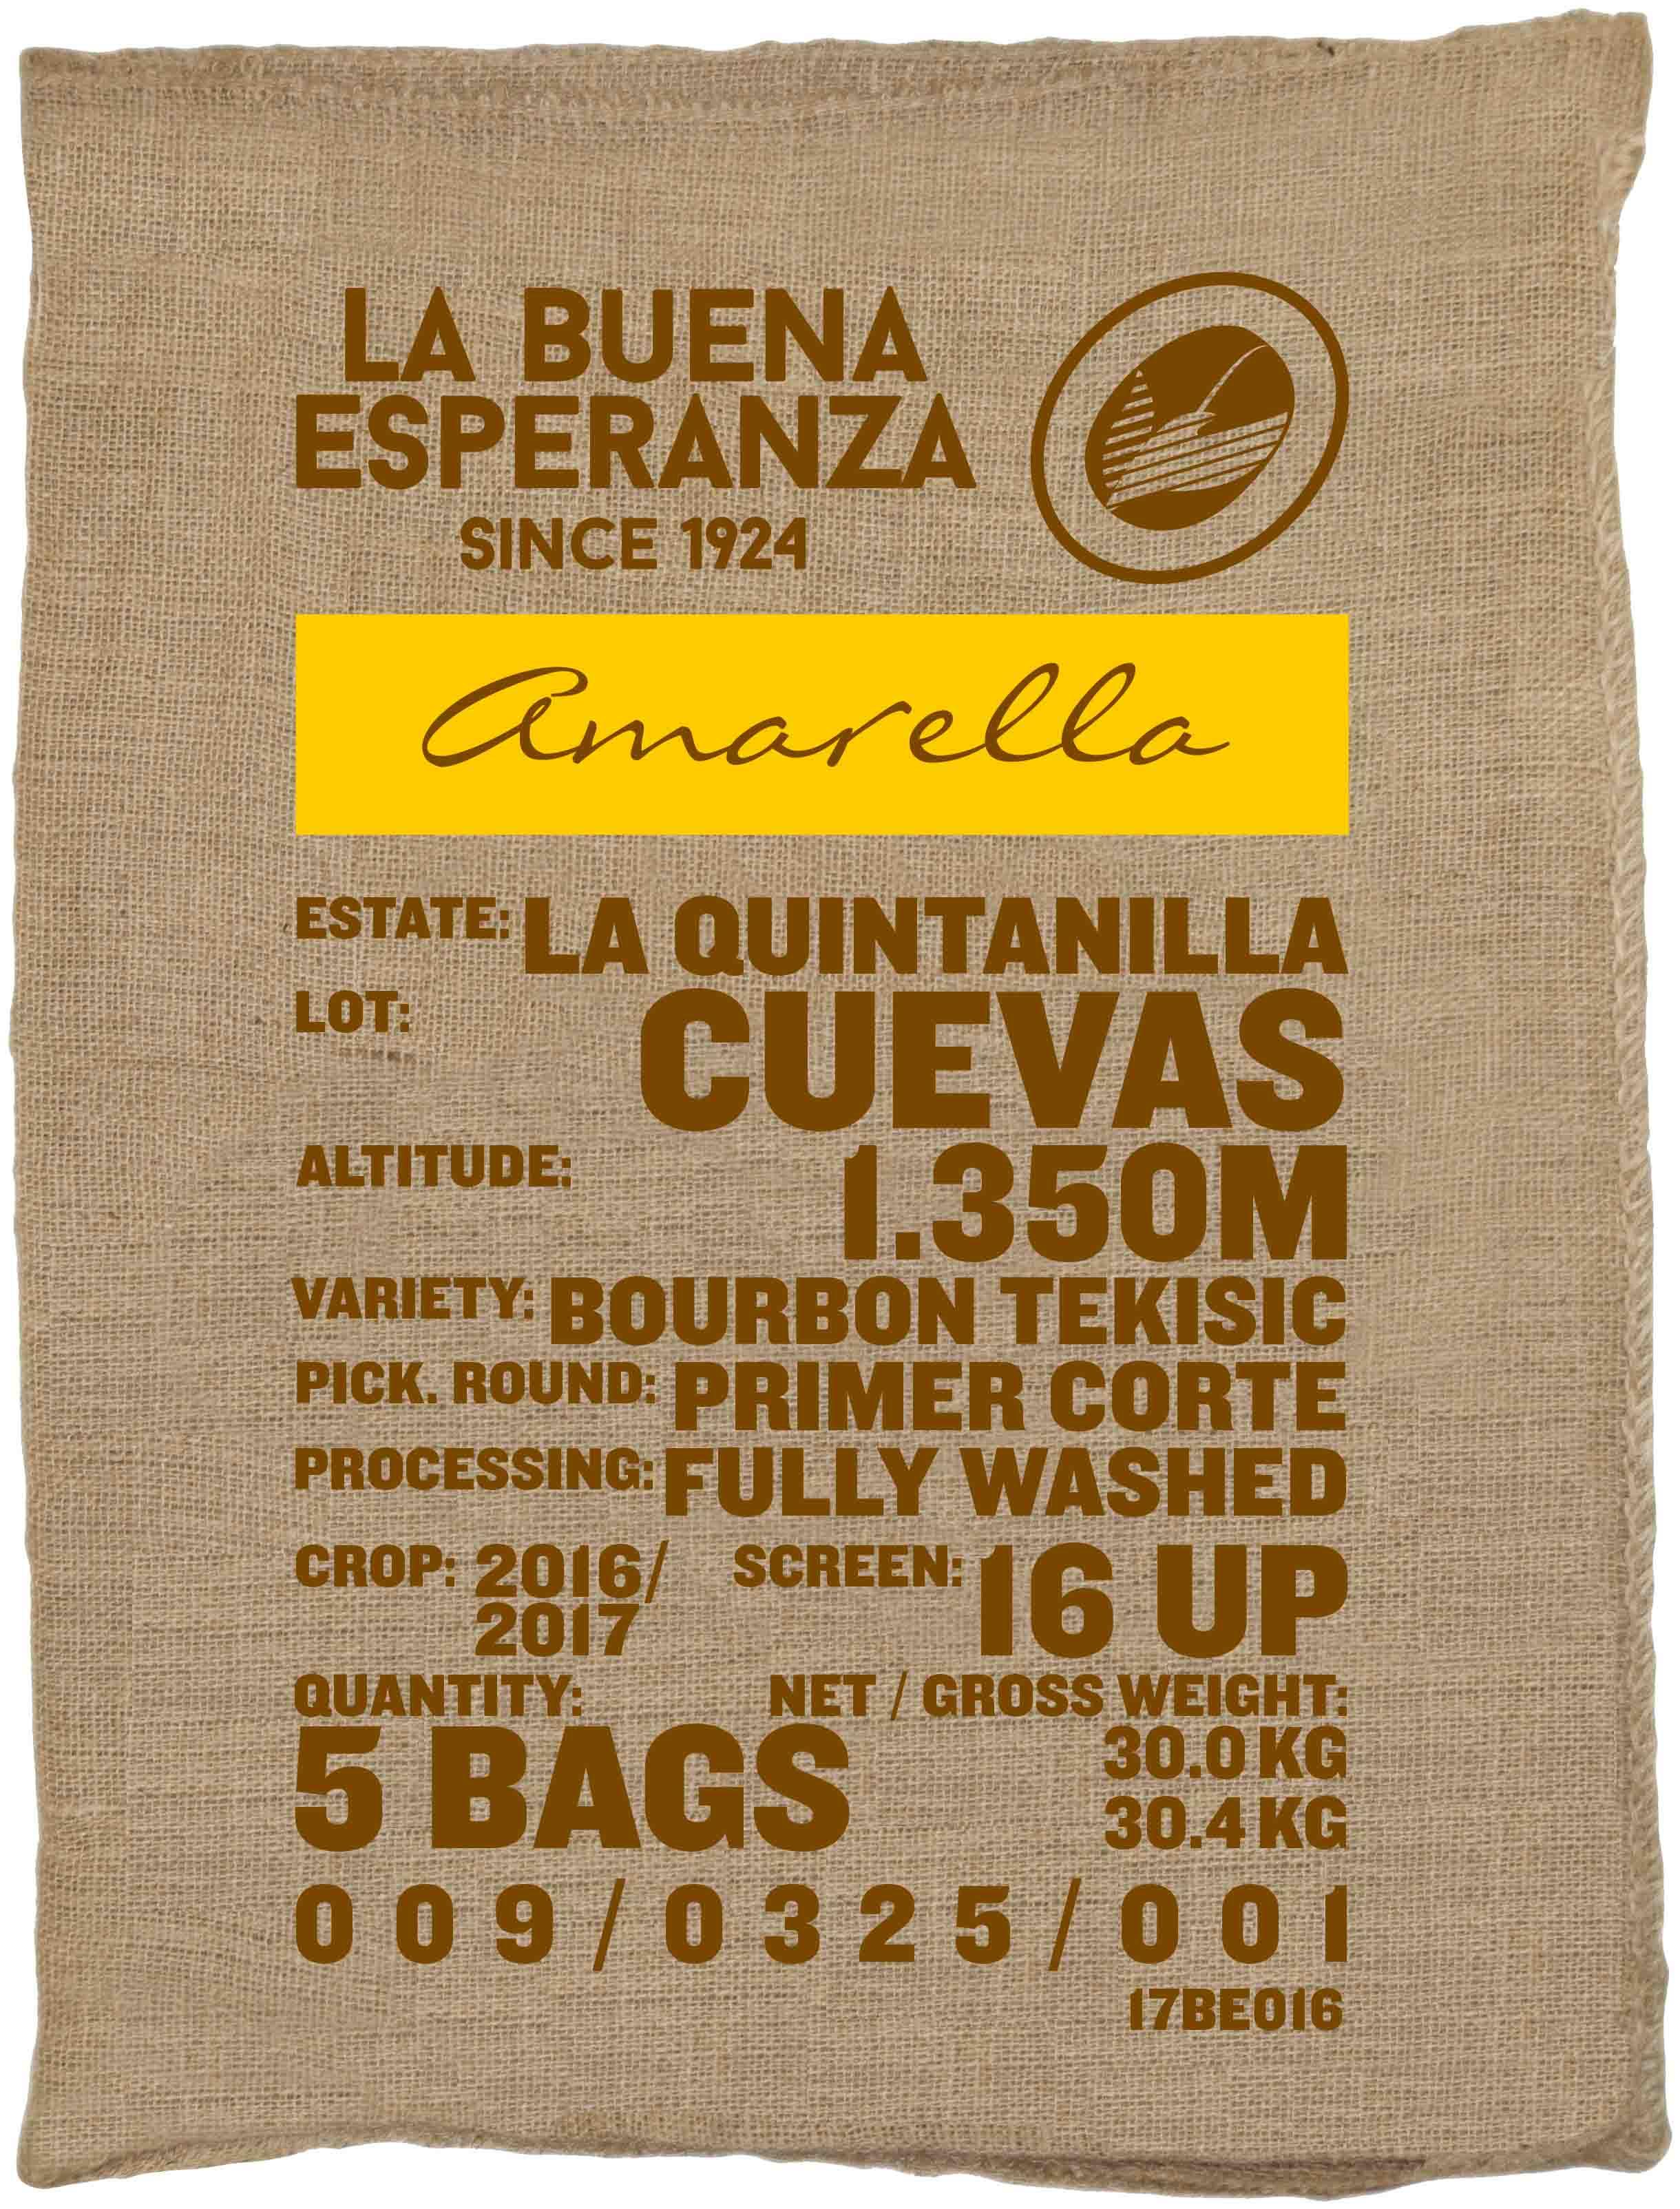 Ein Rohkaffeesack amarella Parzellenkaffee Varietät Bourbon Tekisic. Finca La Buena Esperanza Lot Cuevas.